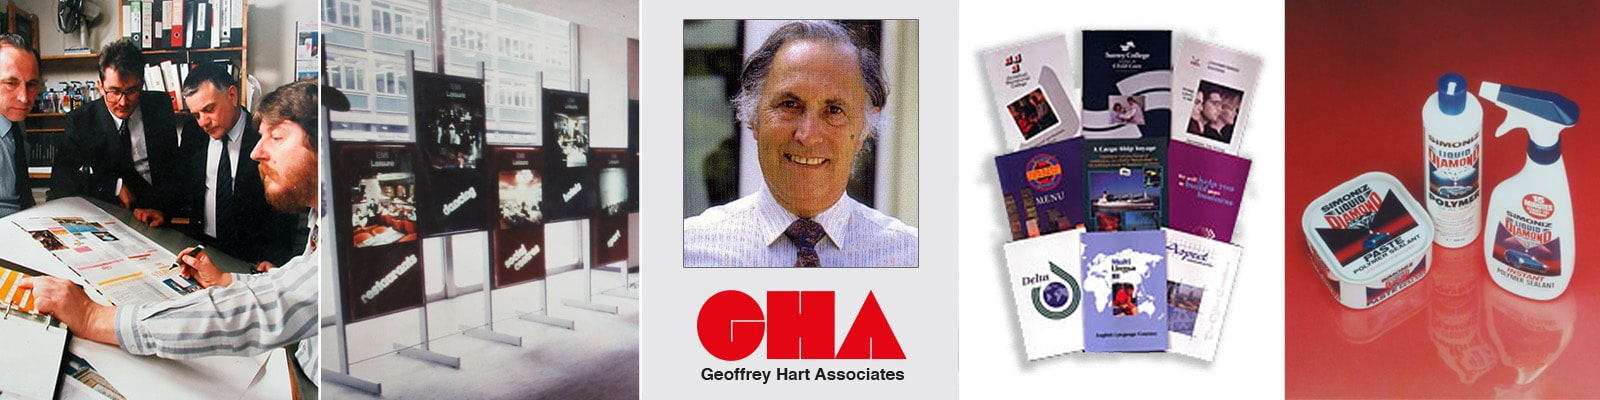 Geoffrey Hart Associates